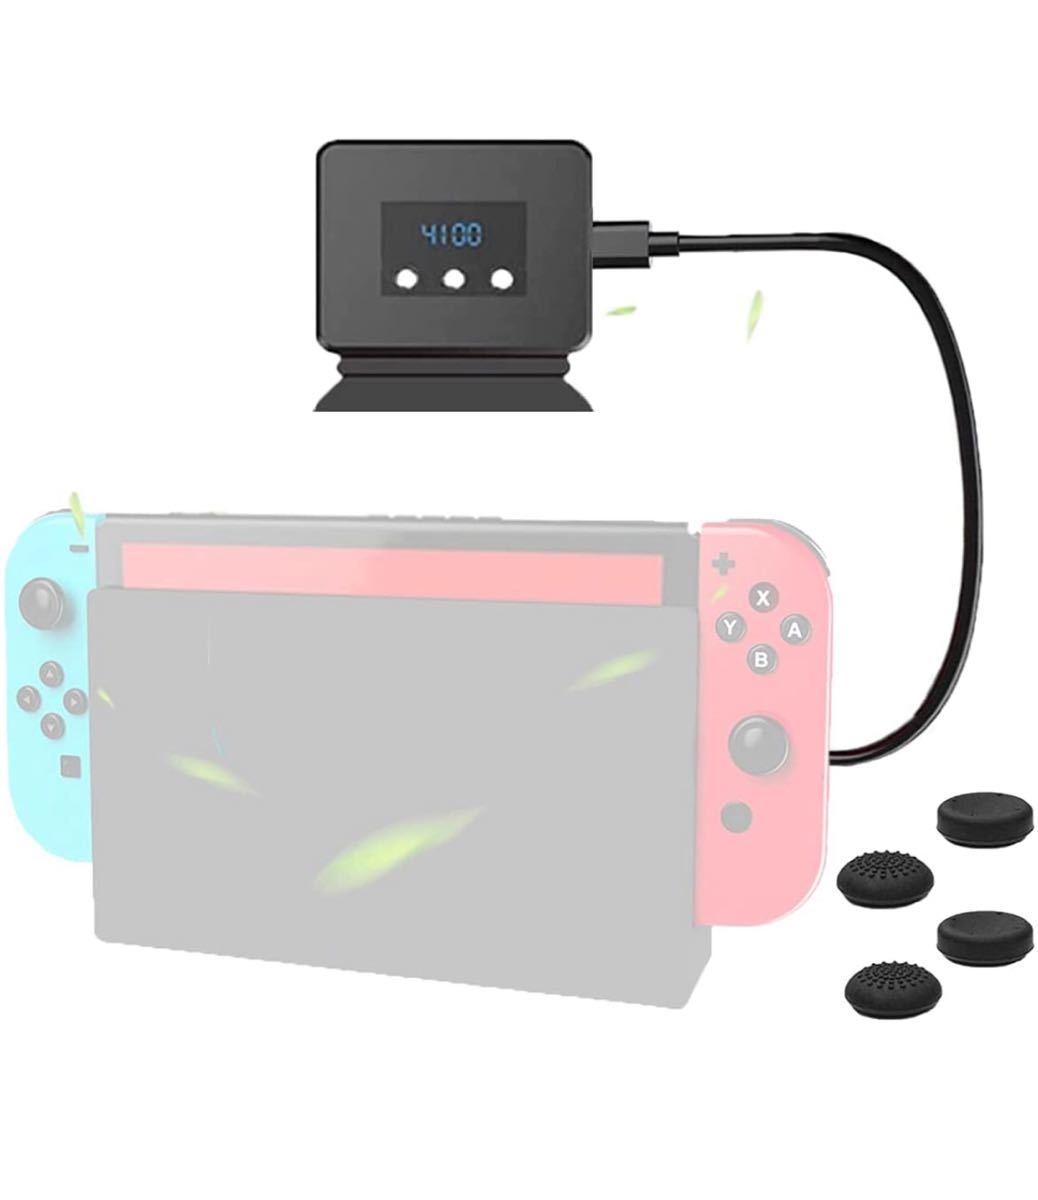 Nintendo Switch 冷却ファン 任天堂 スイッチ専用 冷却 クーラー ハイパワー冷却ファン 熱対策 スイッチドック